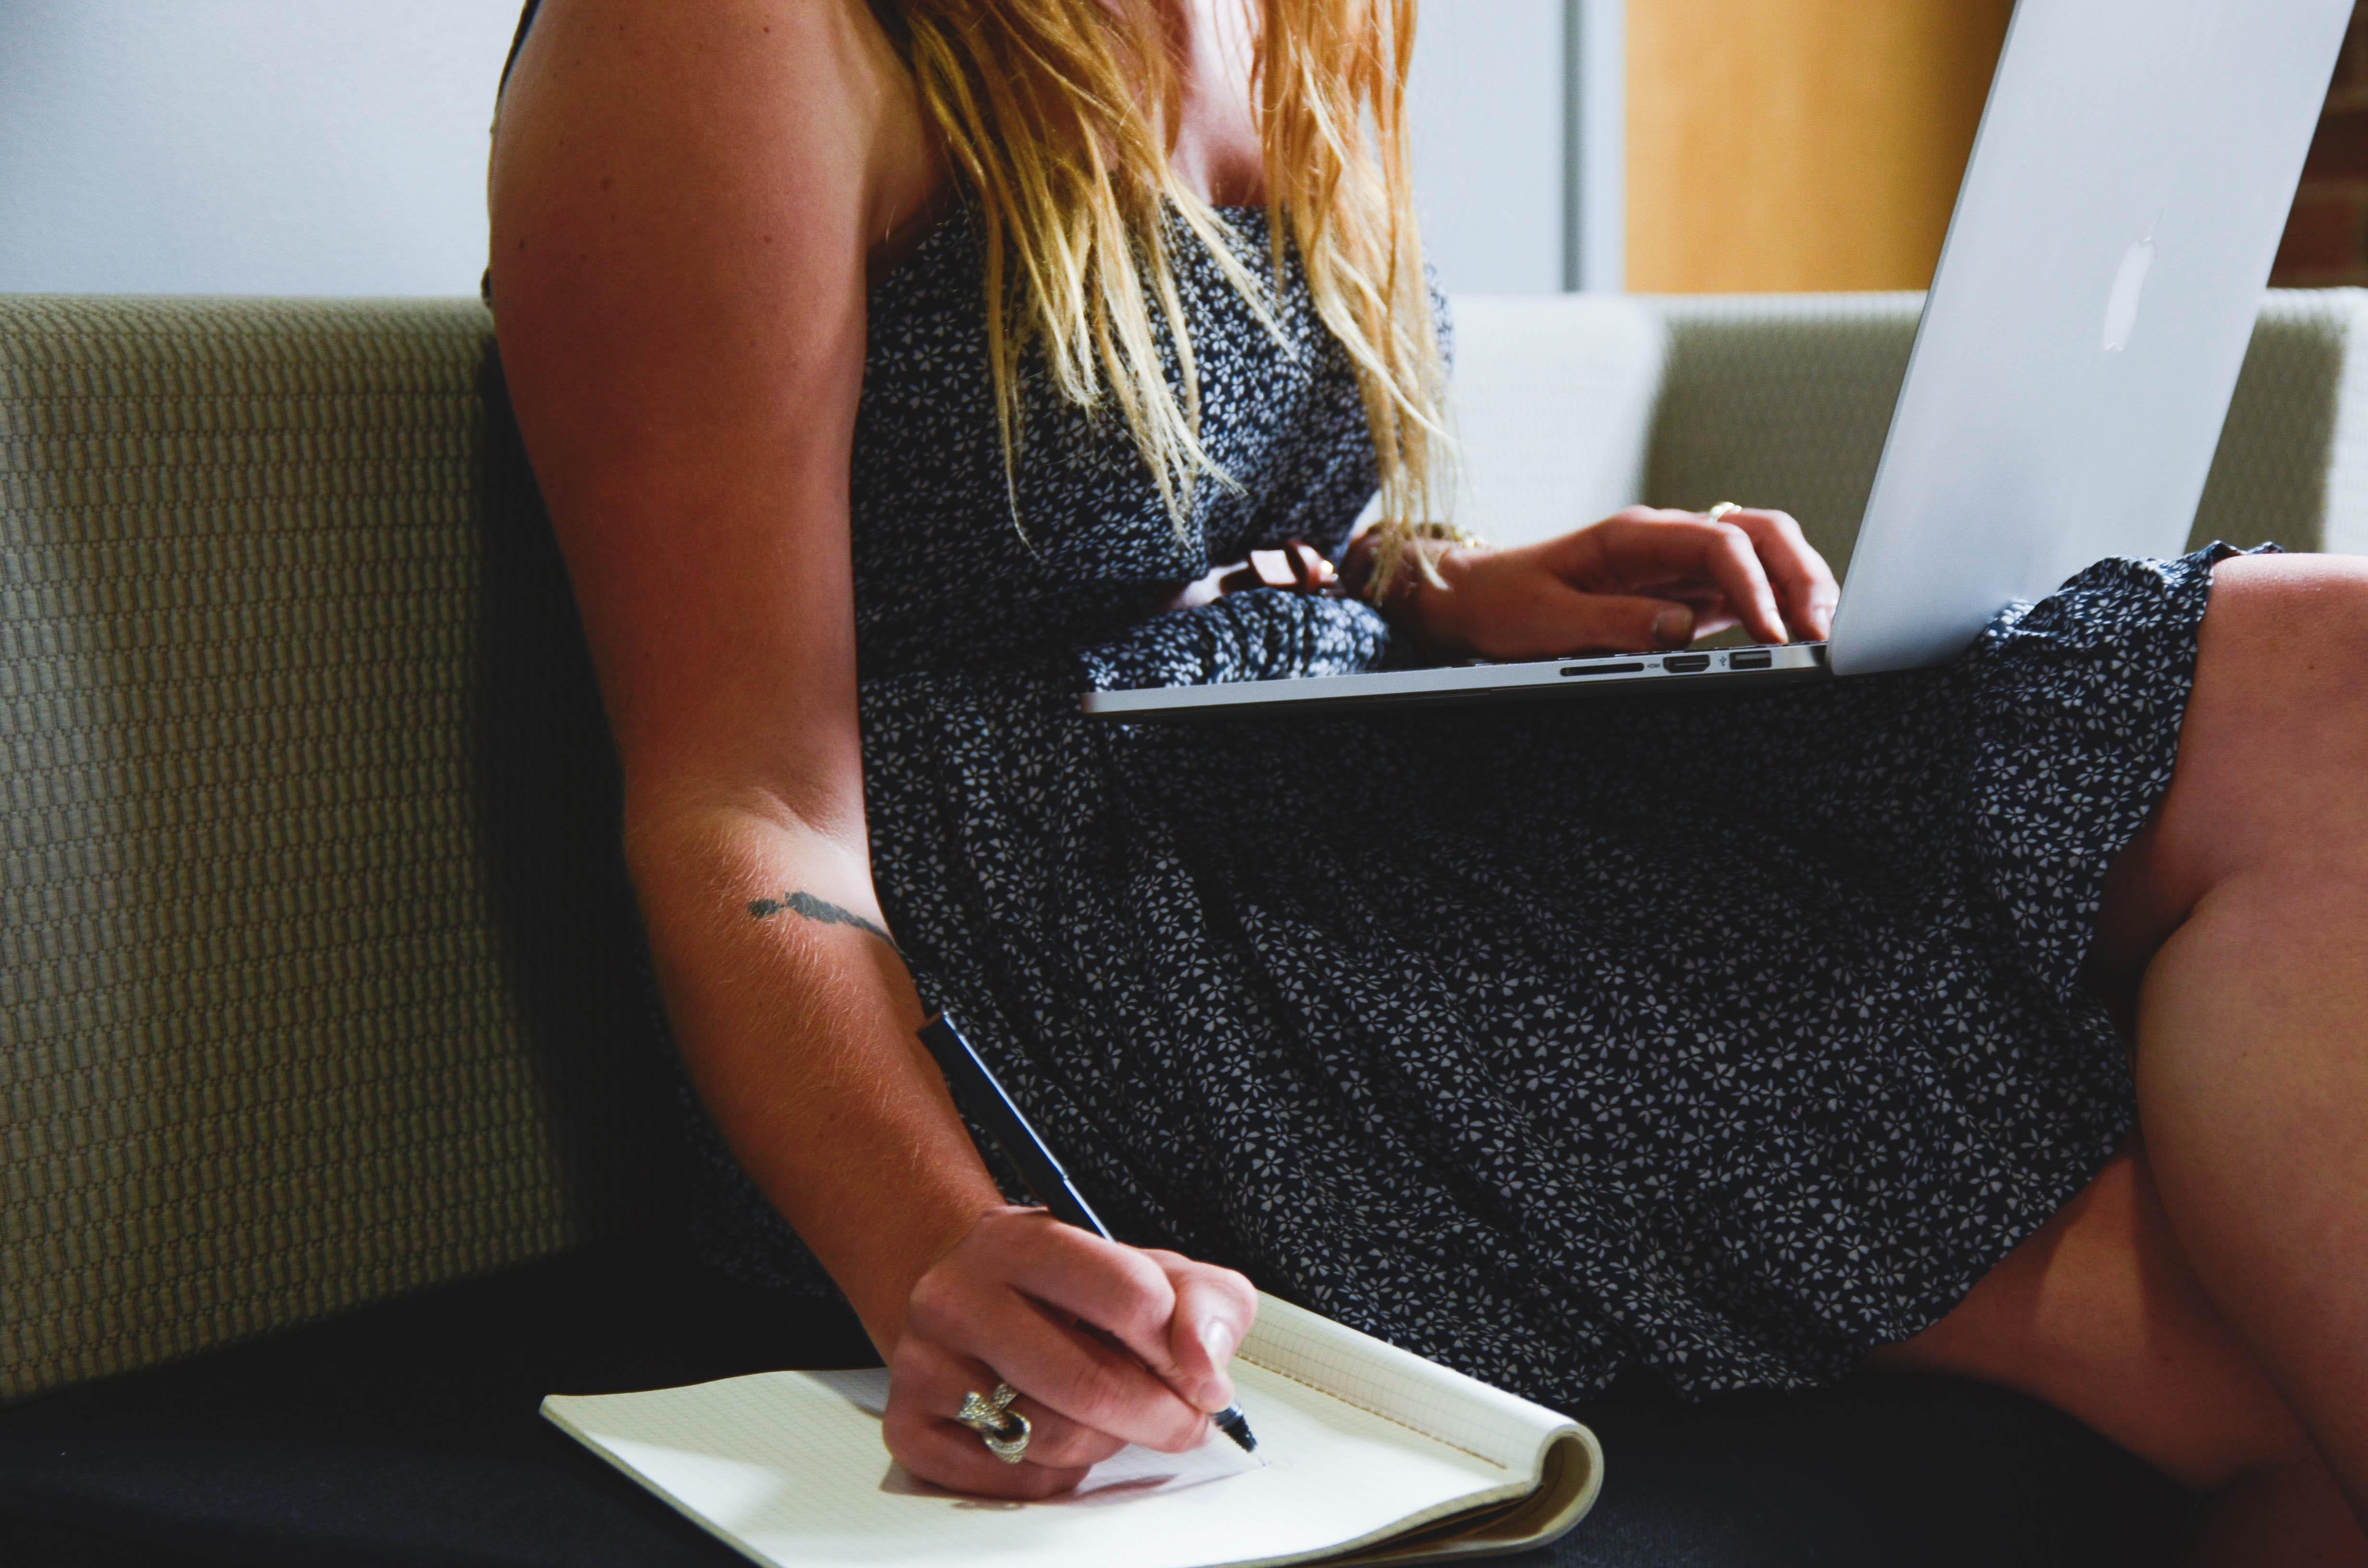 Fotos gratis : ordenador portátil, computadora, Macbook, escritura ...